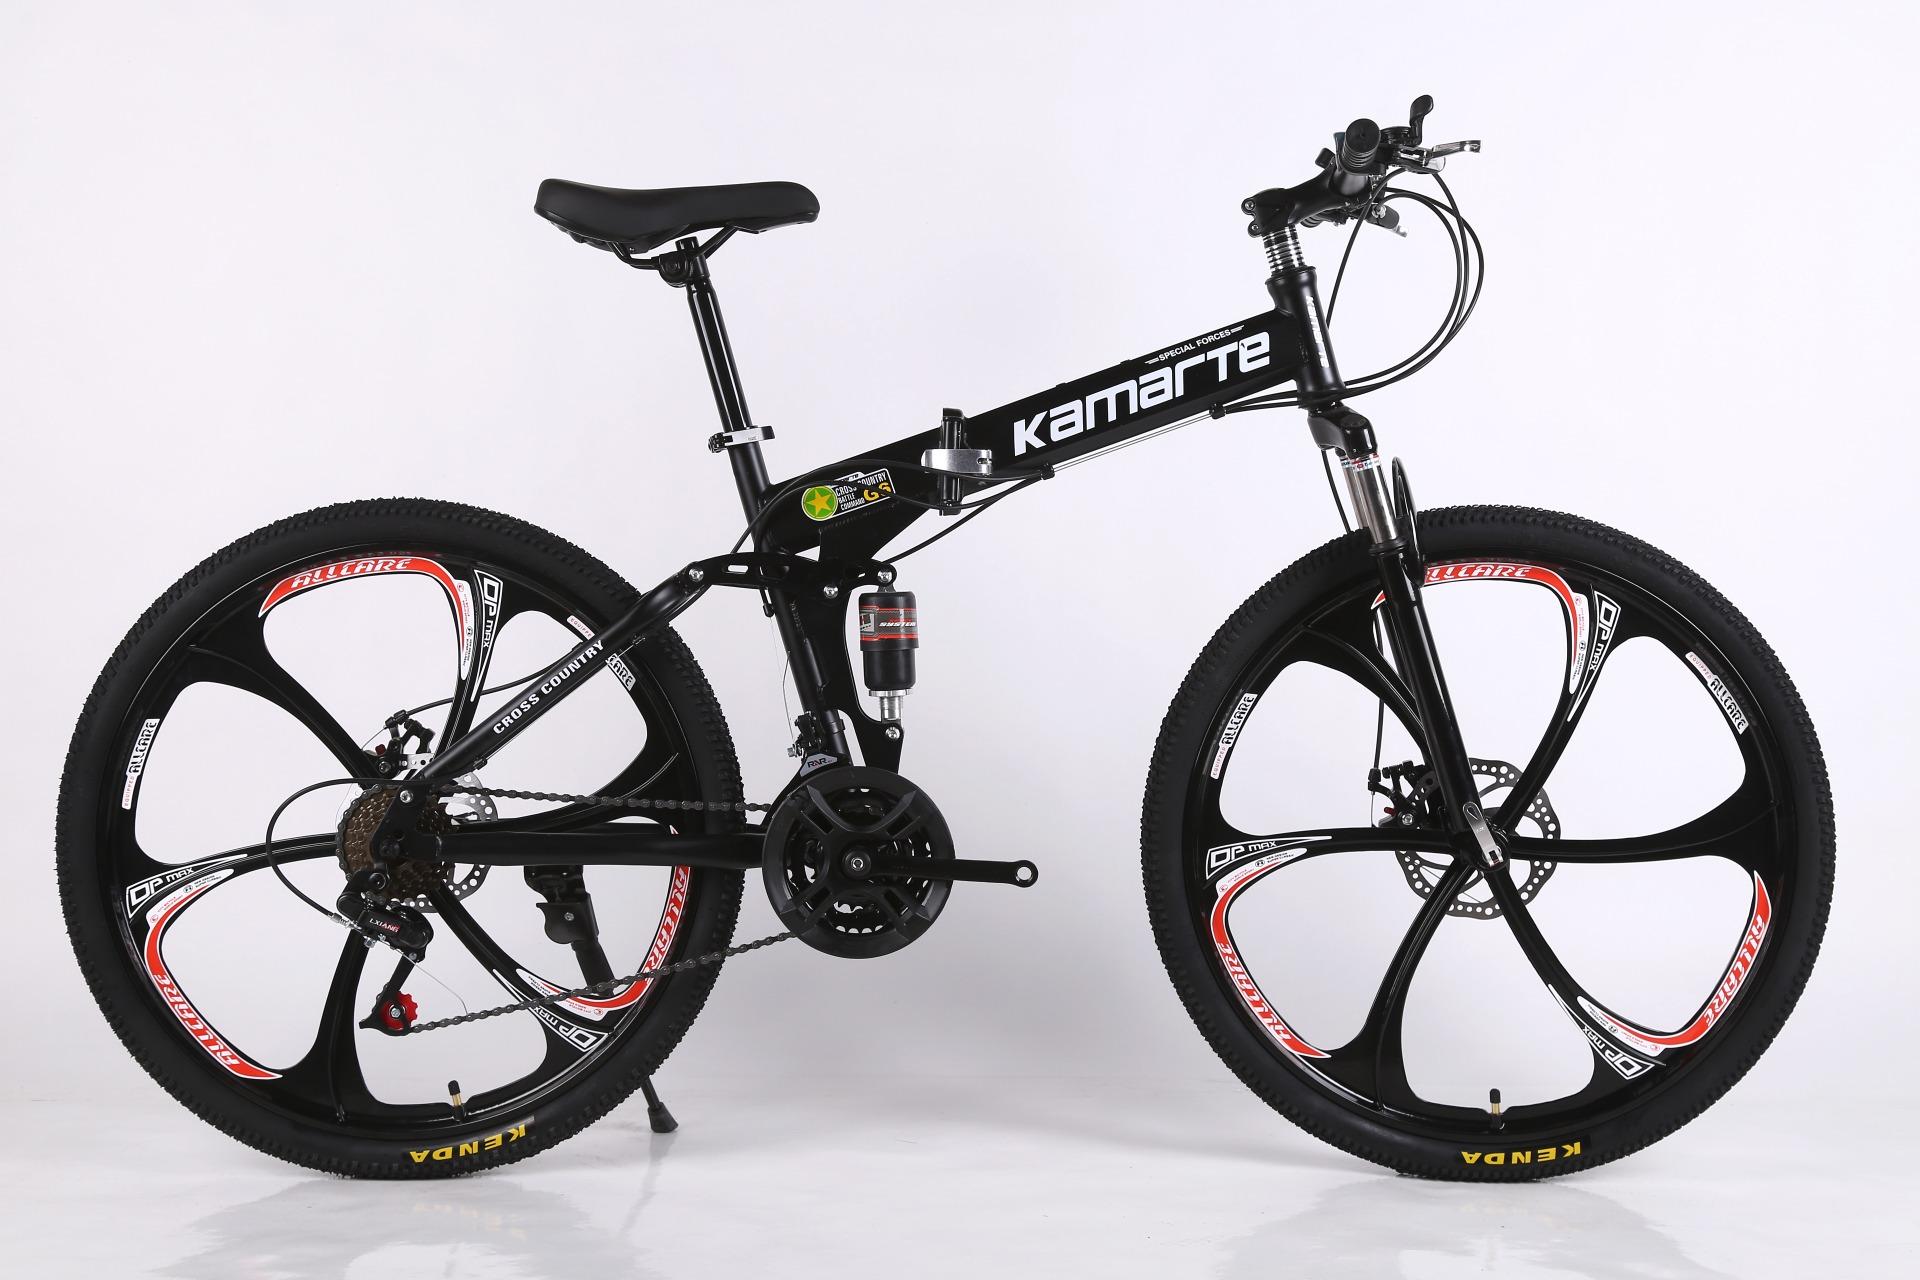 Kamarte Cross Battle Comand G6 26″ Folding Mountain Bike ...